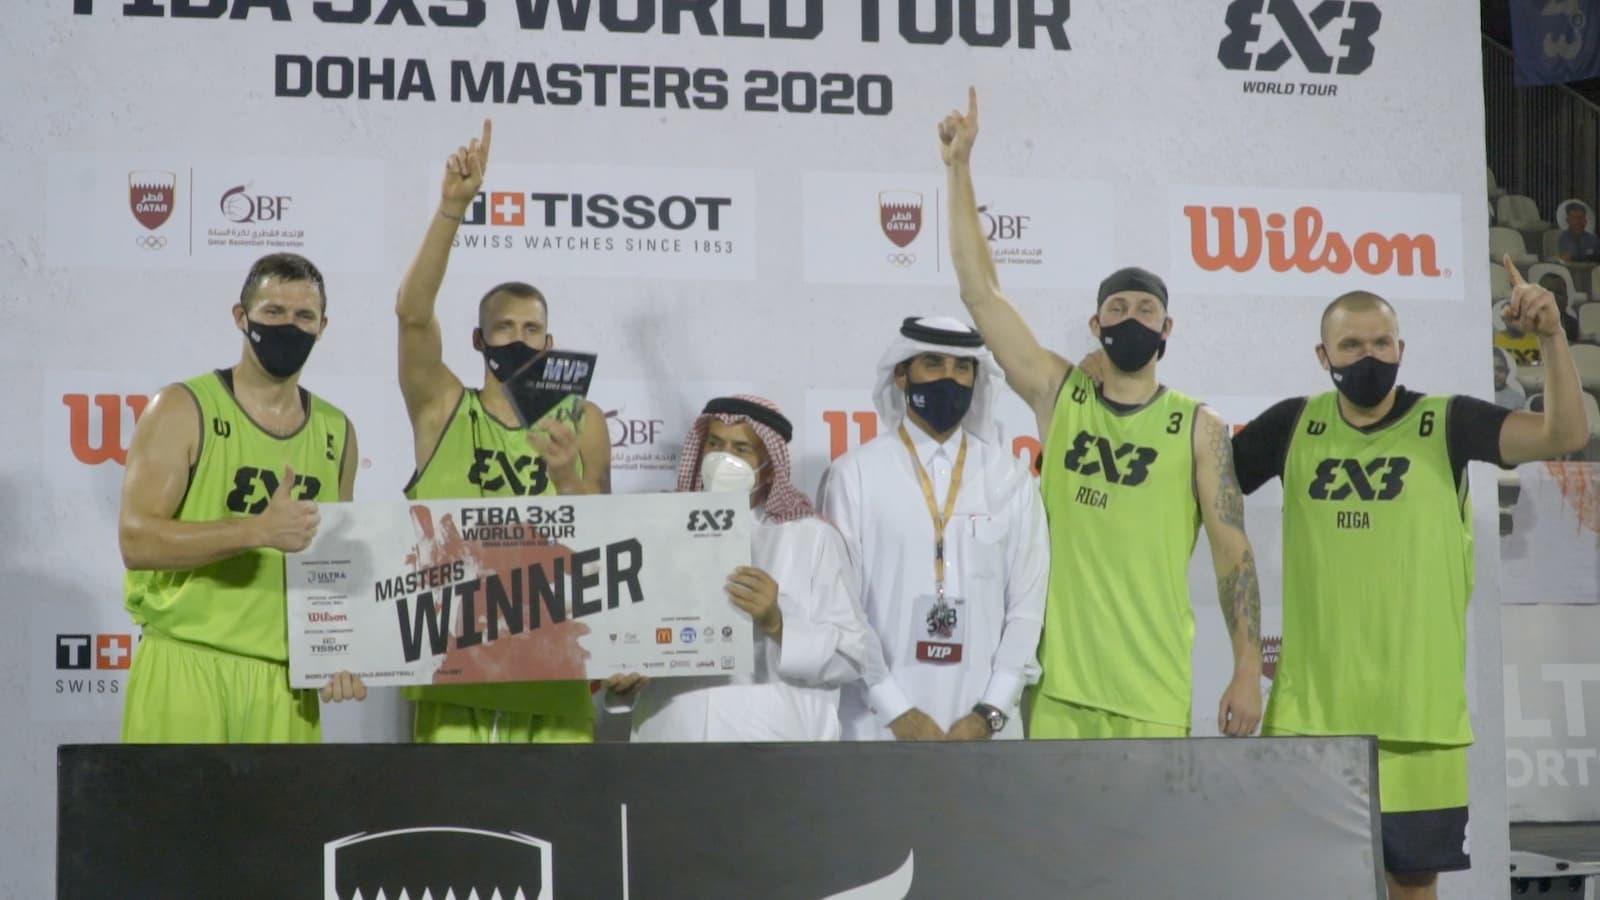 WATCH:Lasmanis hits amazing buzzer-beater as Riga claims FIBA 3x3 World Tour Doha Masters 2020 crown